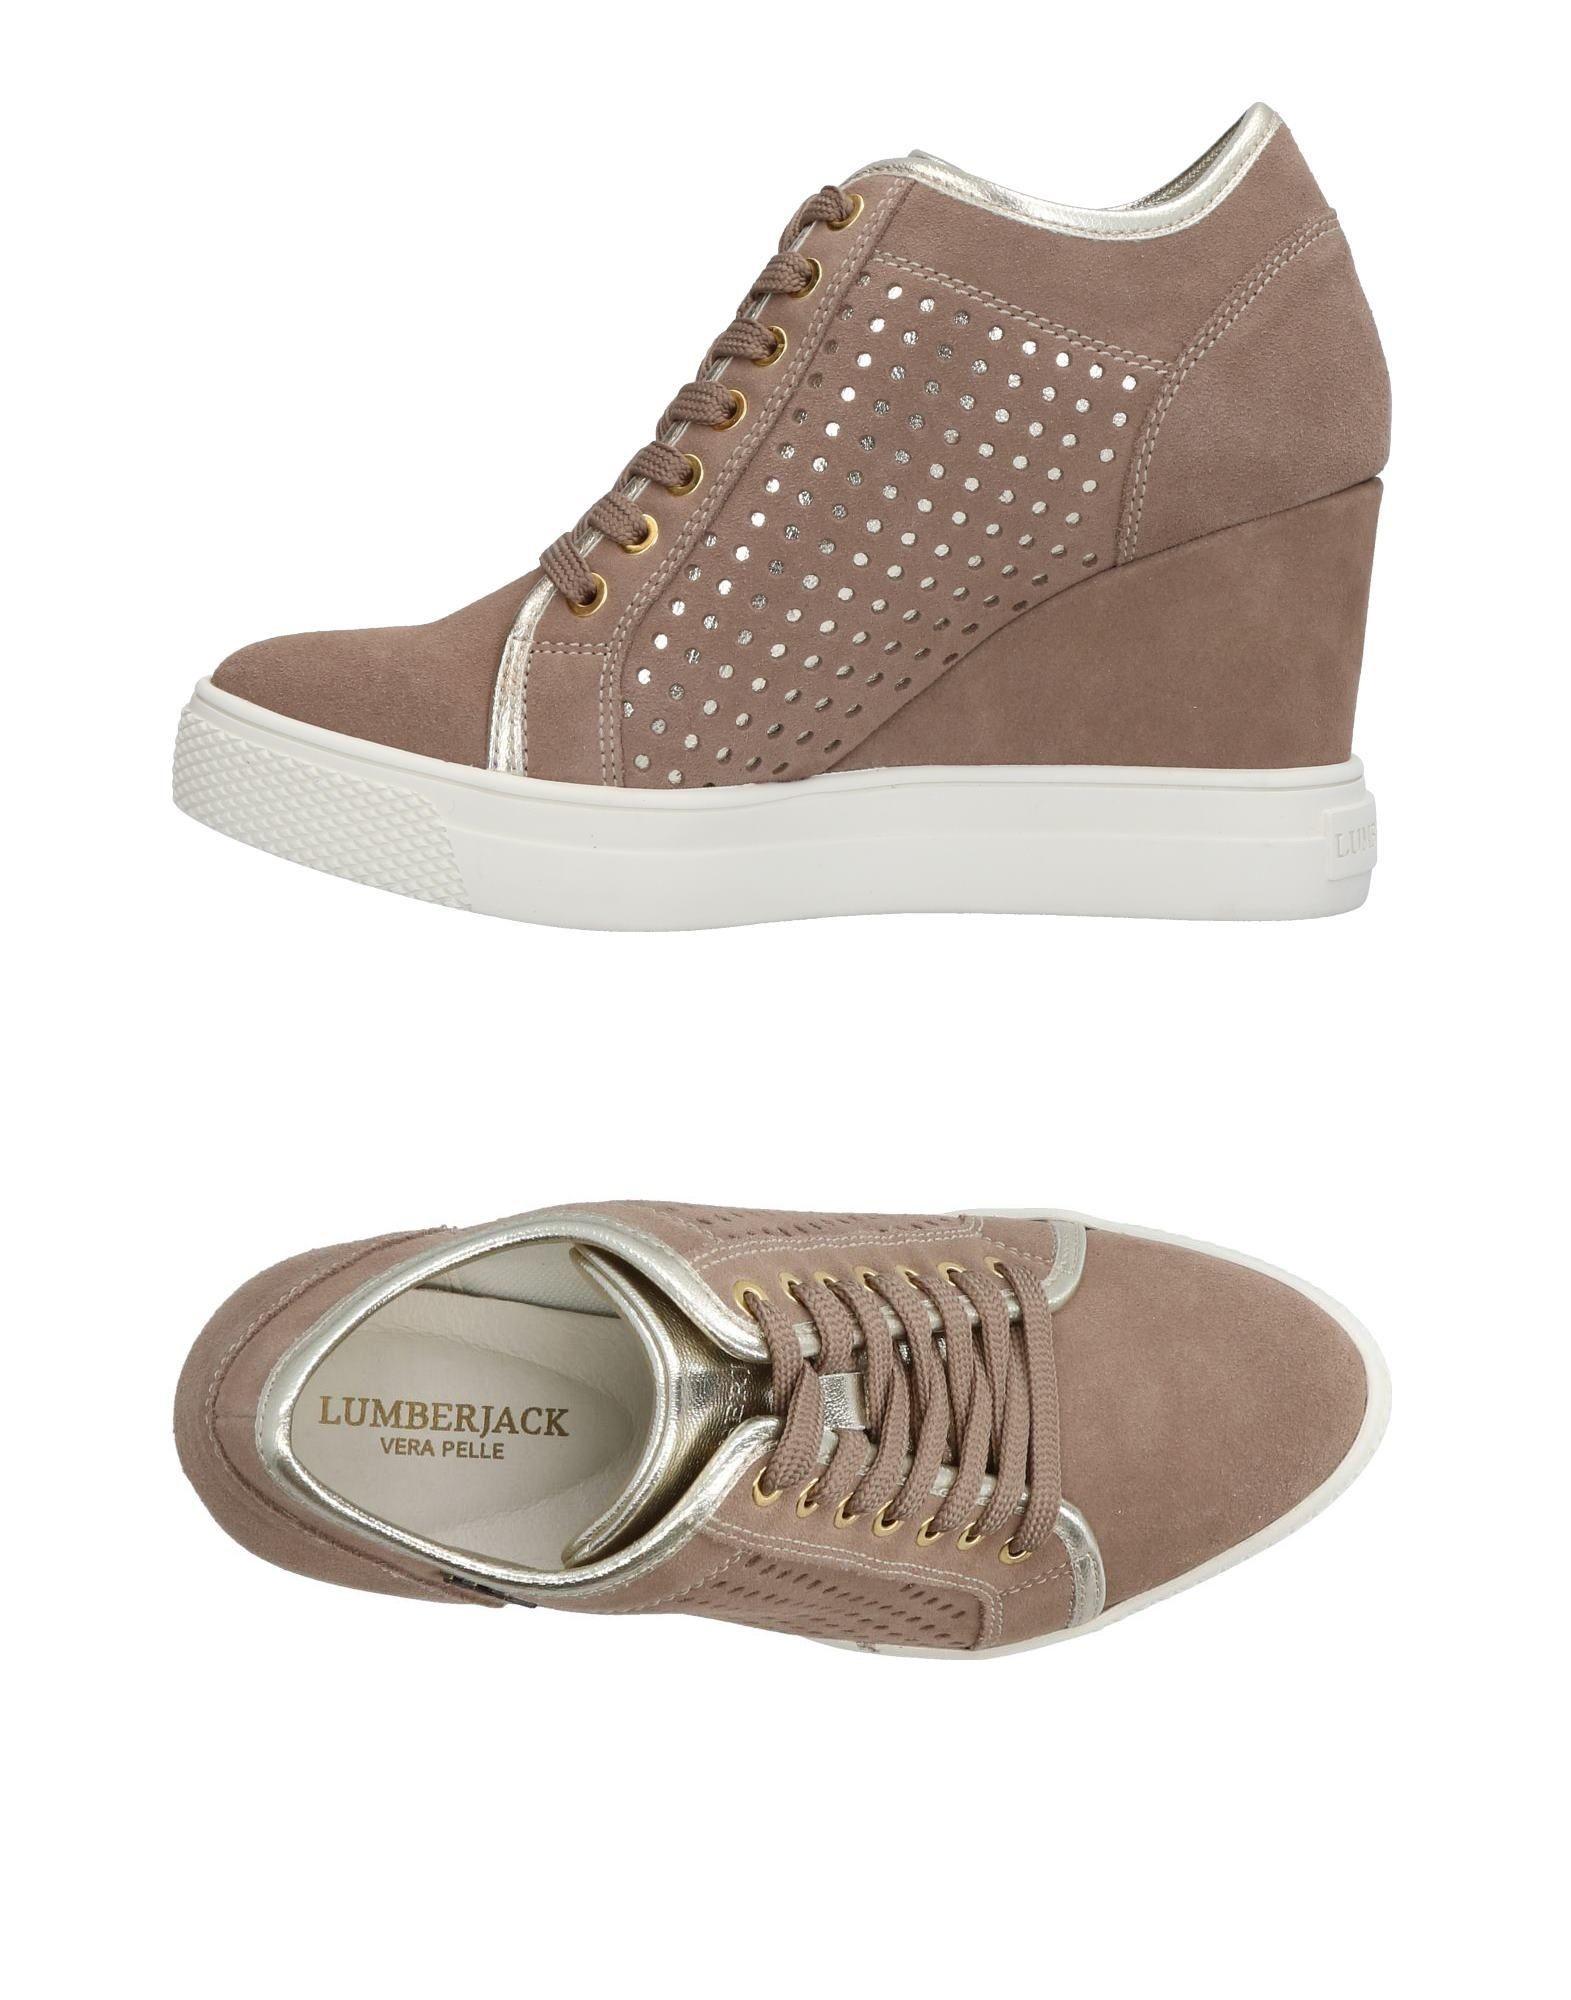 Sneakers Lumberjack Donna - 11342112KA Scarpe economiche e buone